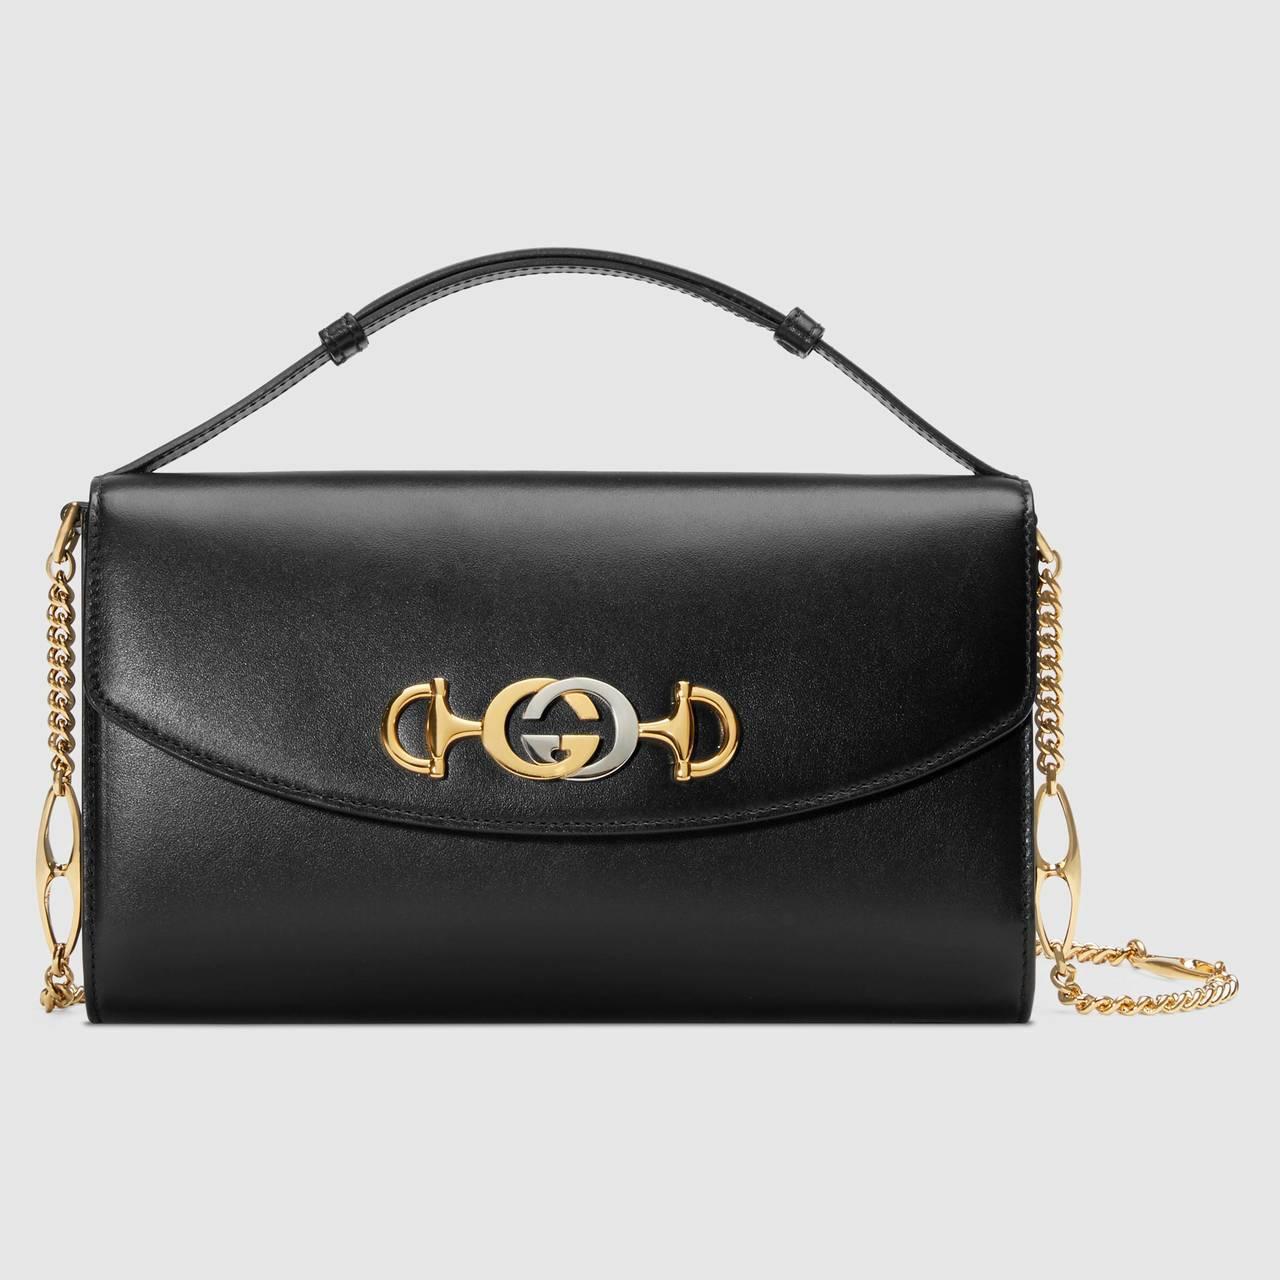 Gucci Zumi黑色迷你肩背包,82,300元。圖/Gucci提供